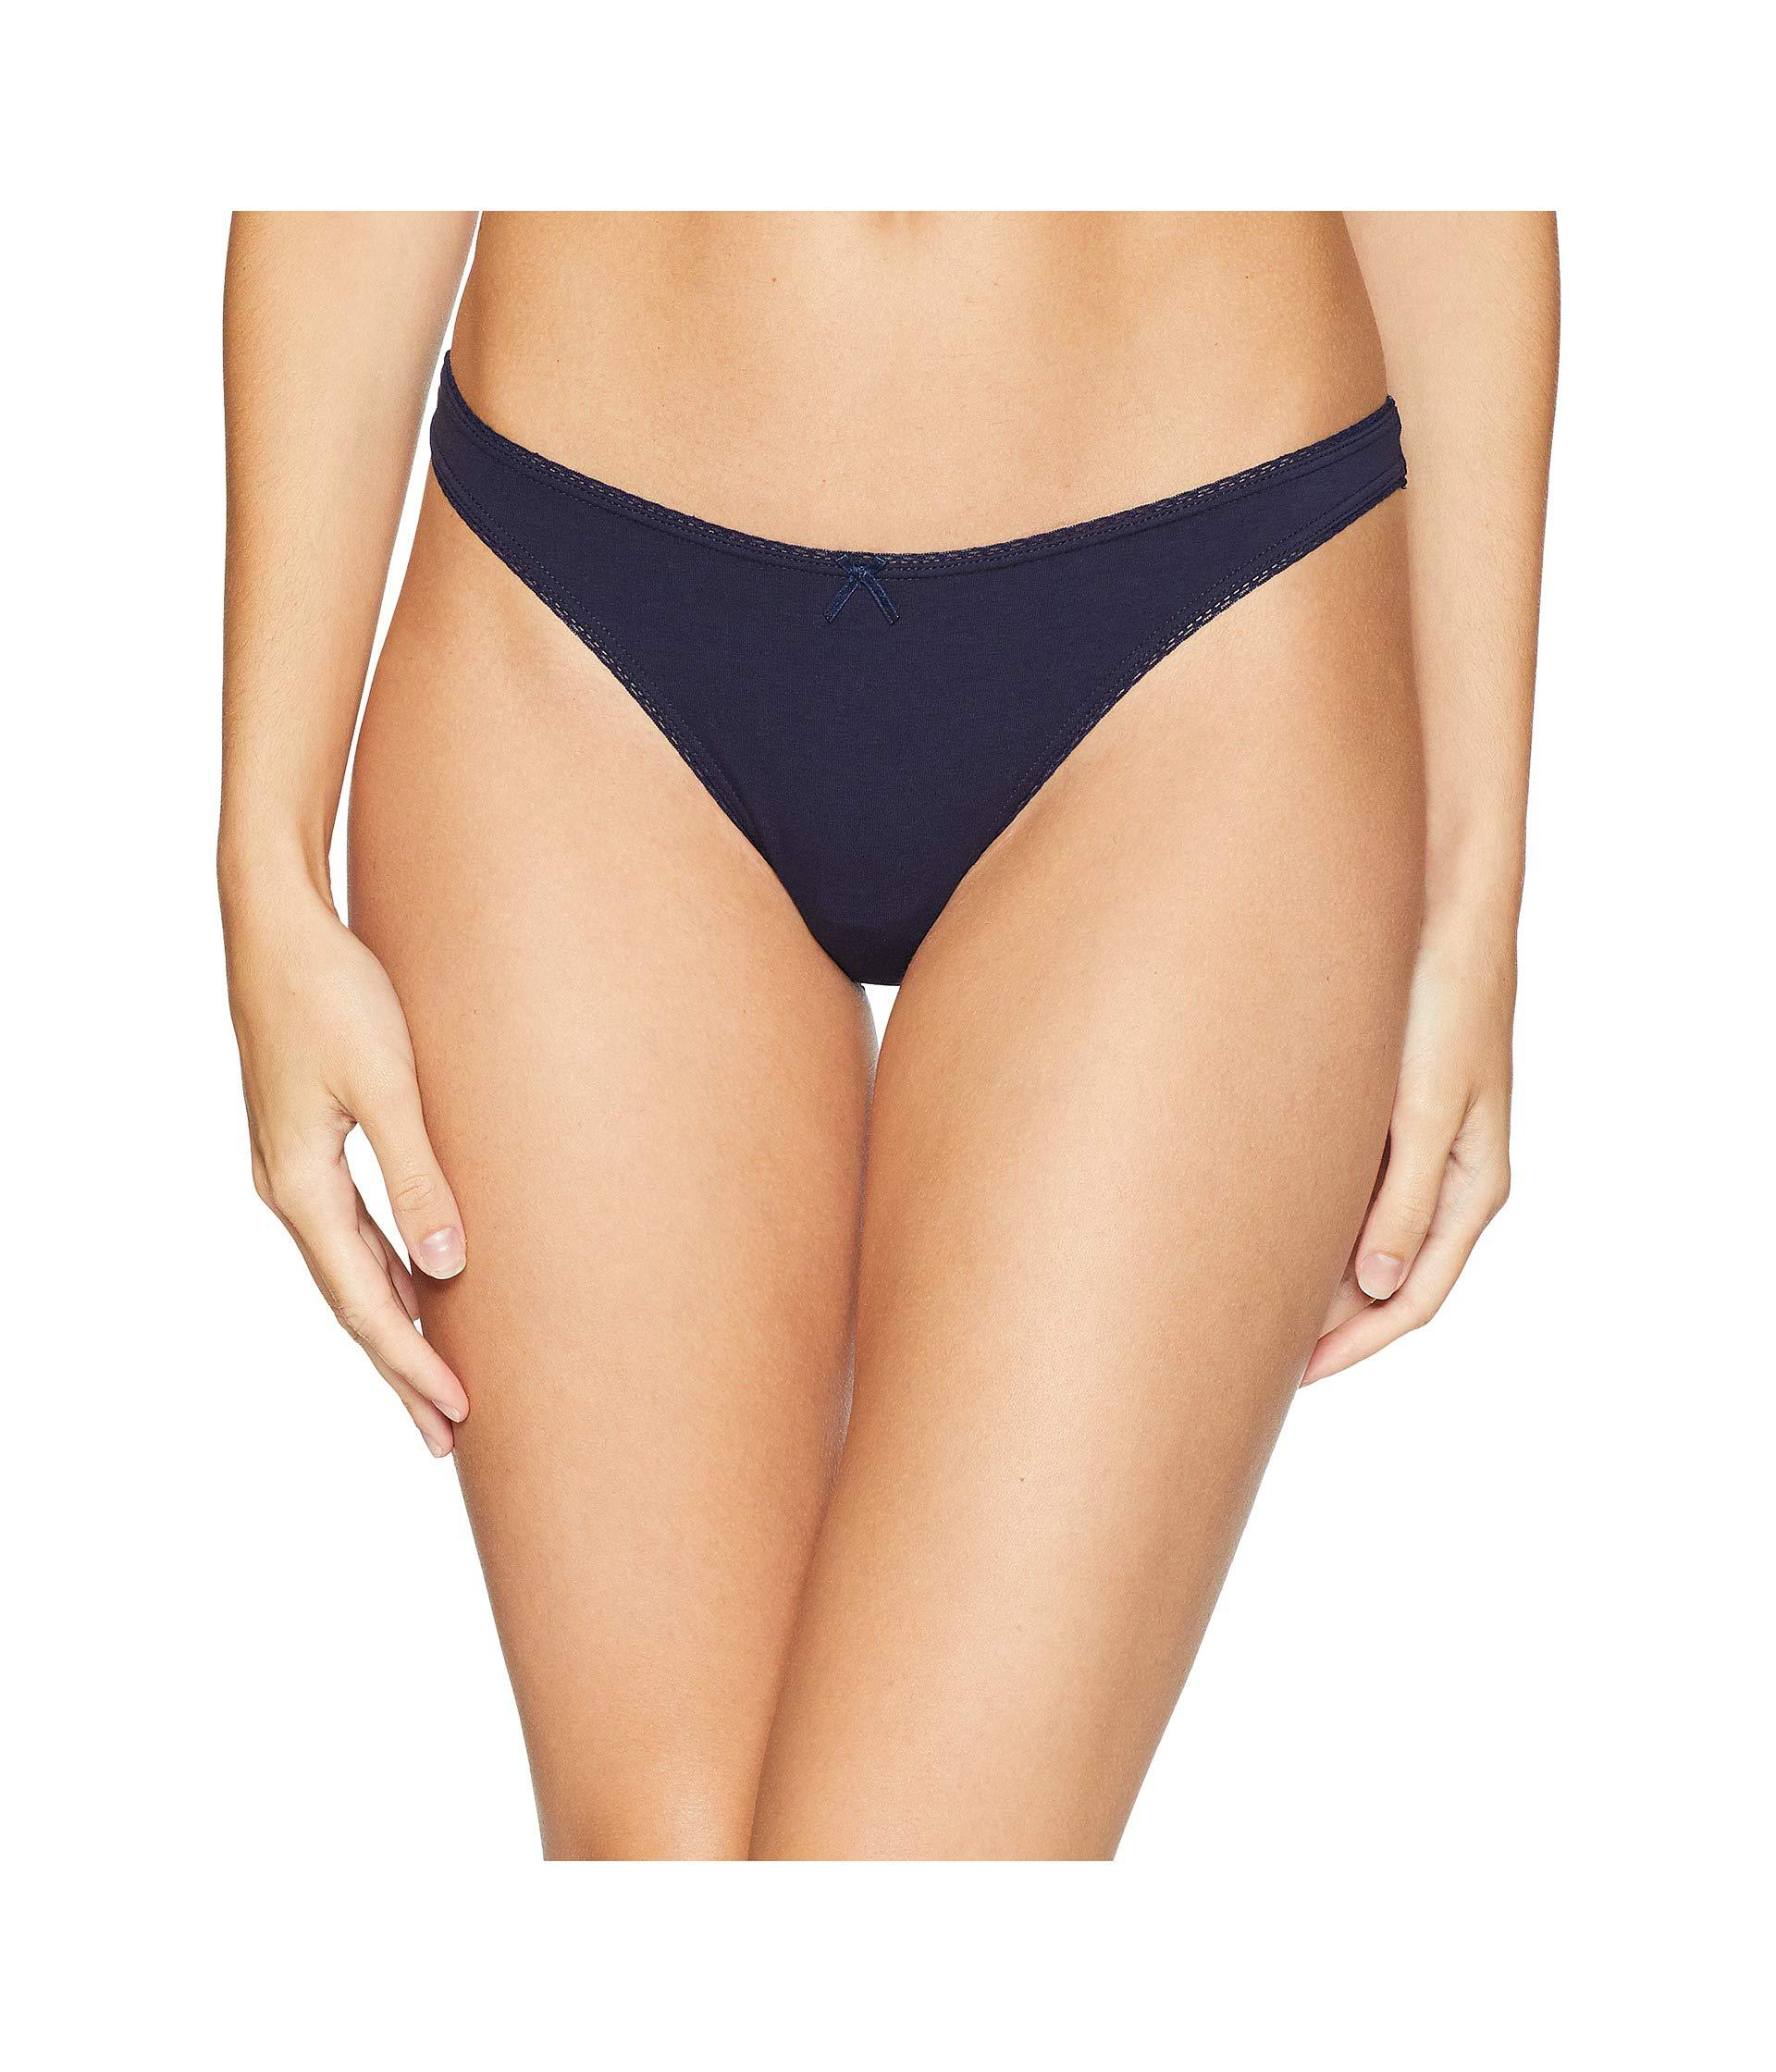 c0714bb1f480 Eberjey - Multicolor Pima Goddess Thong (buff) Women's Underwear - Lyst.  View fullscreen